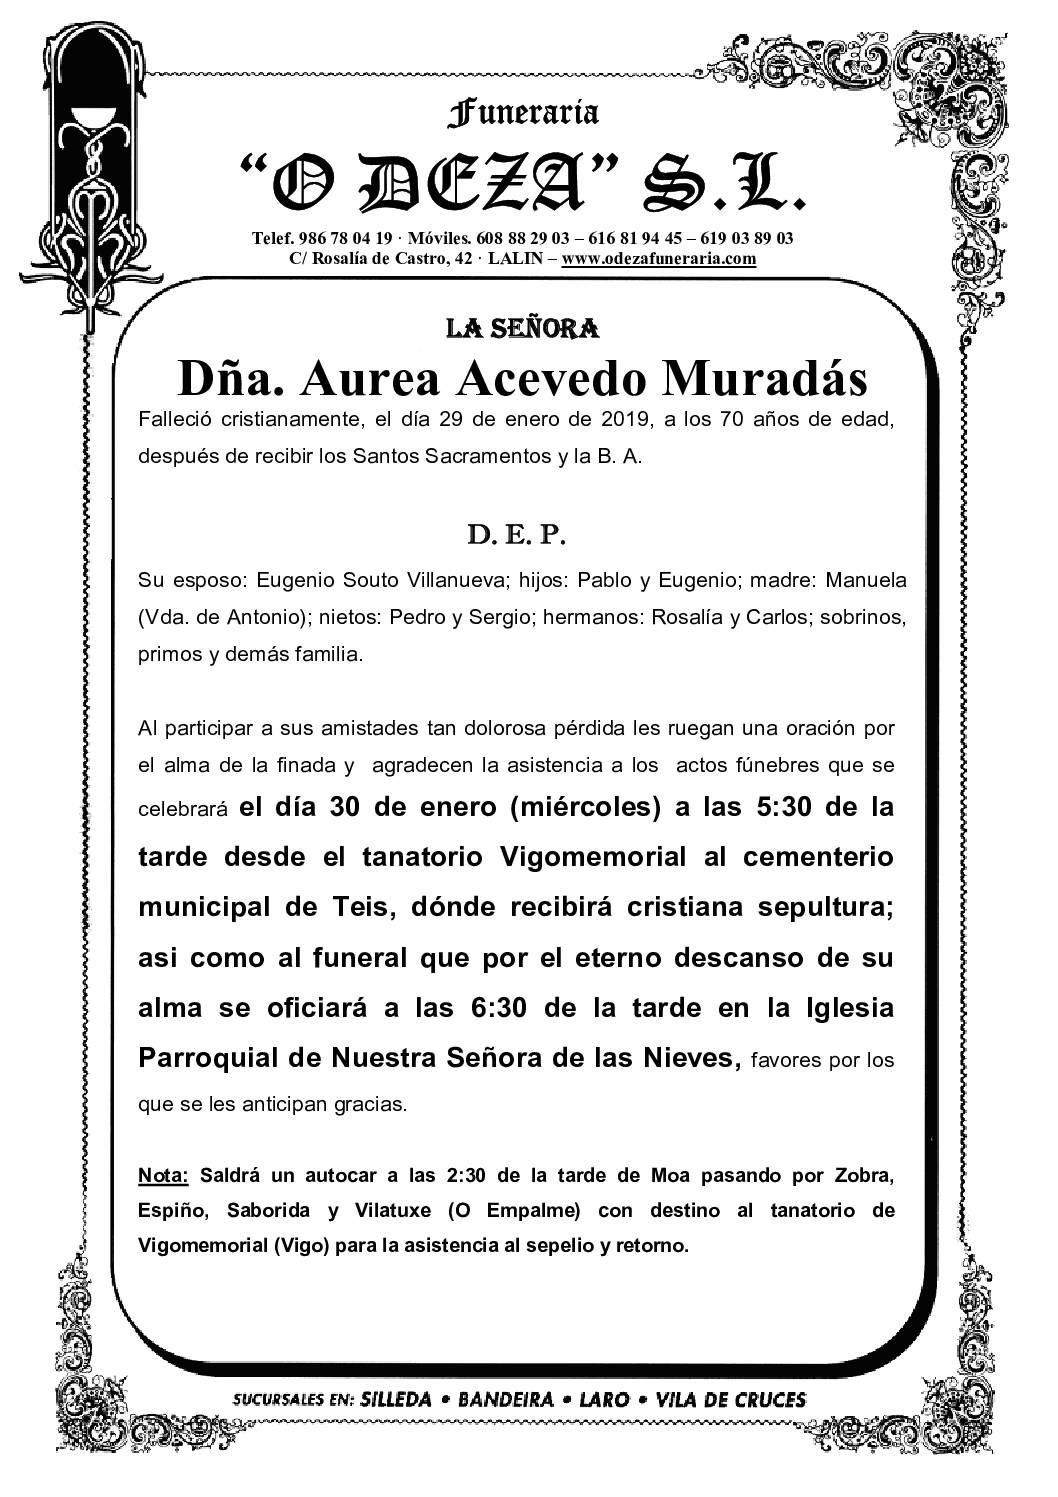 DÑA. AUREA ACEVEDO MURADÁS